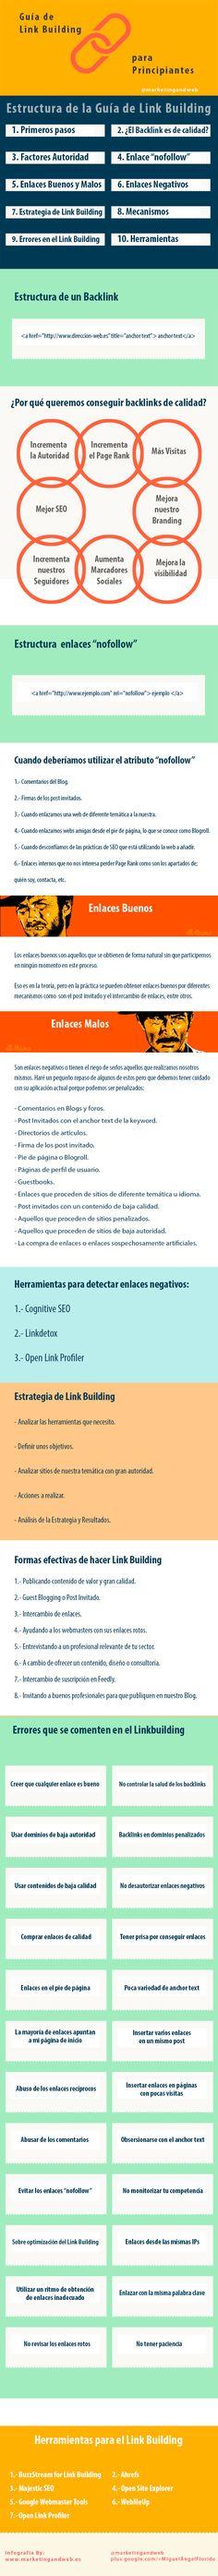 Guía de Link Building para principiantes #infografia